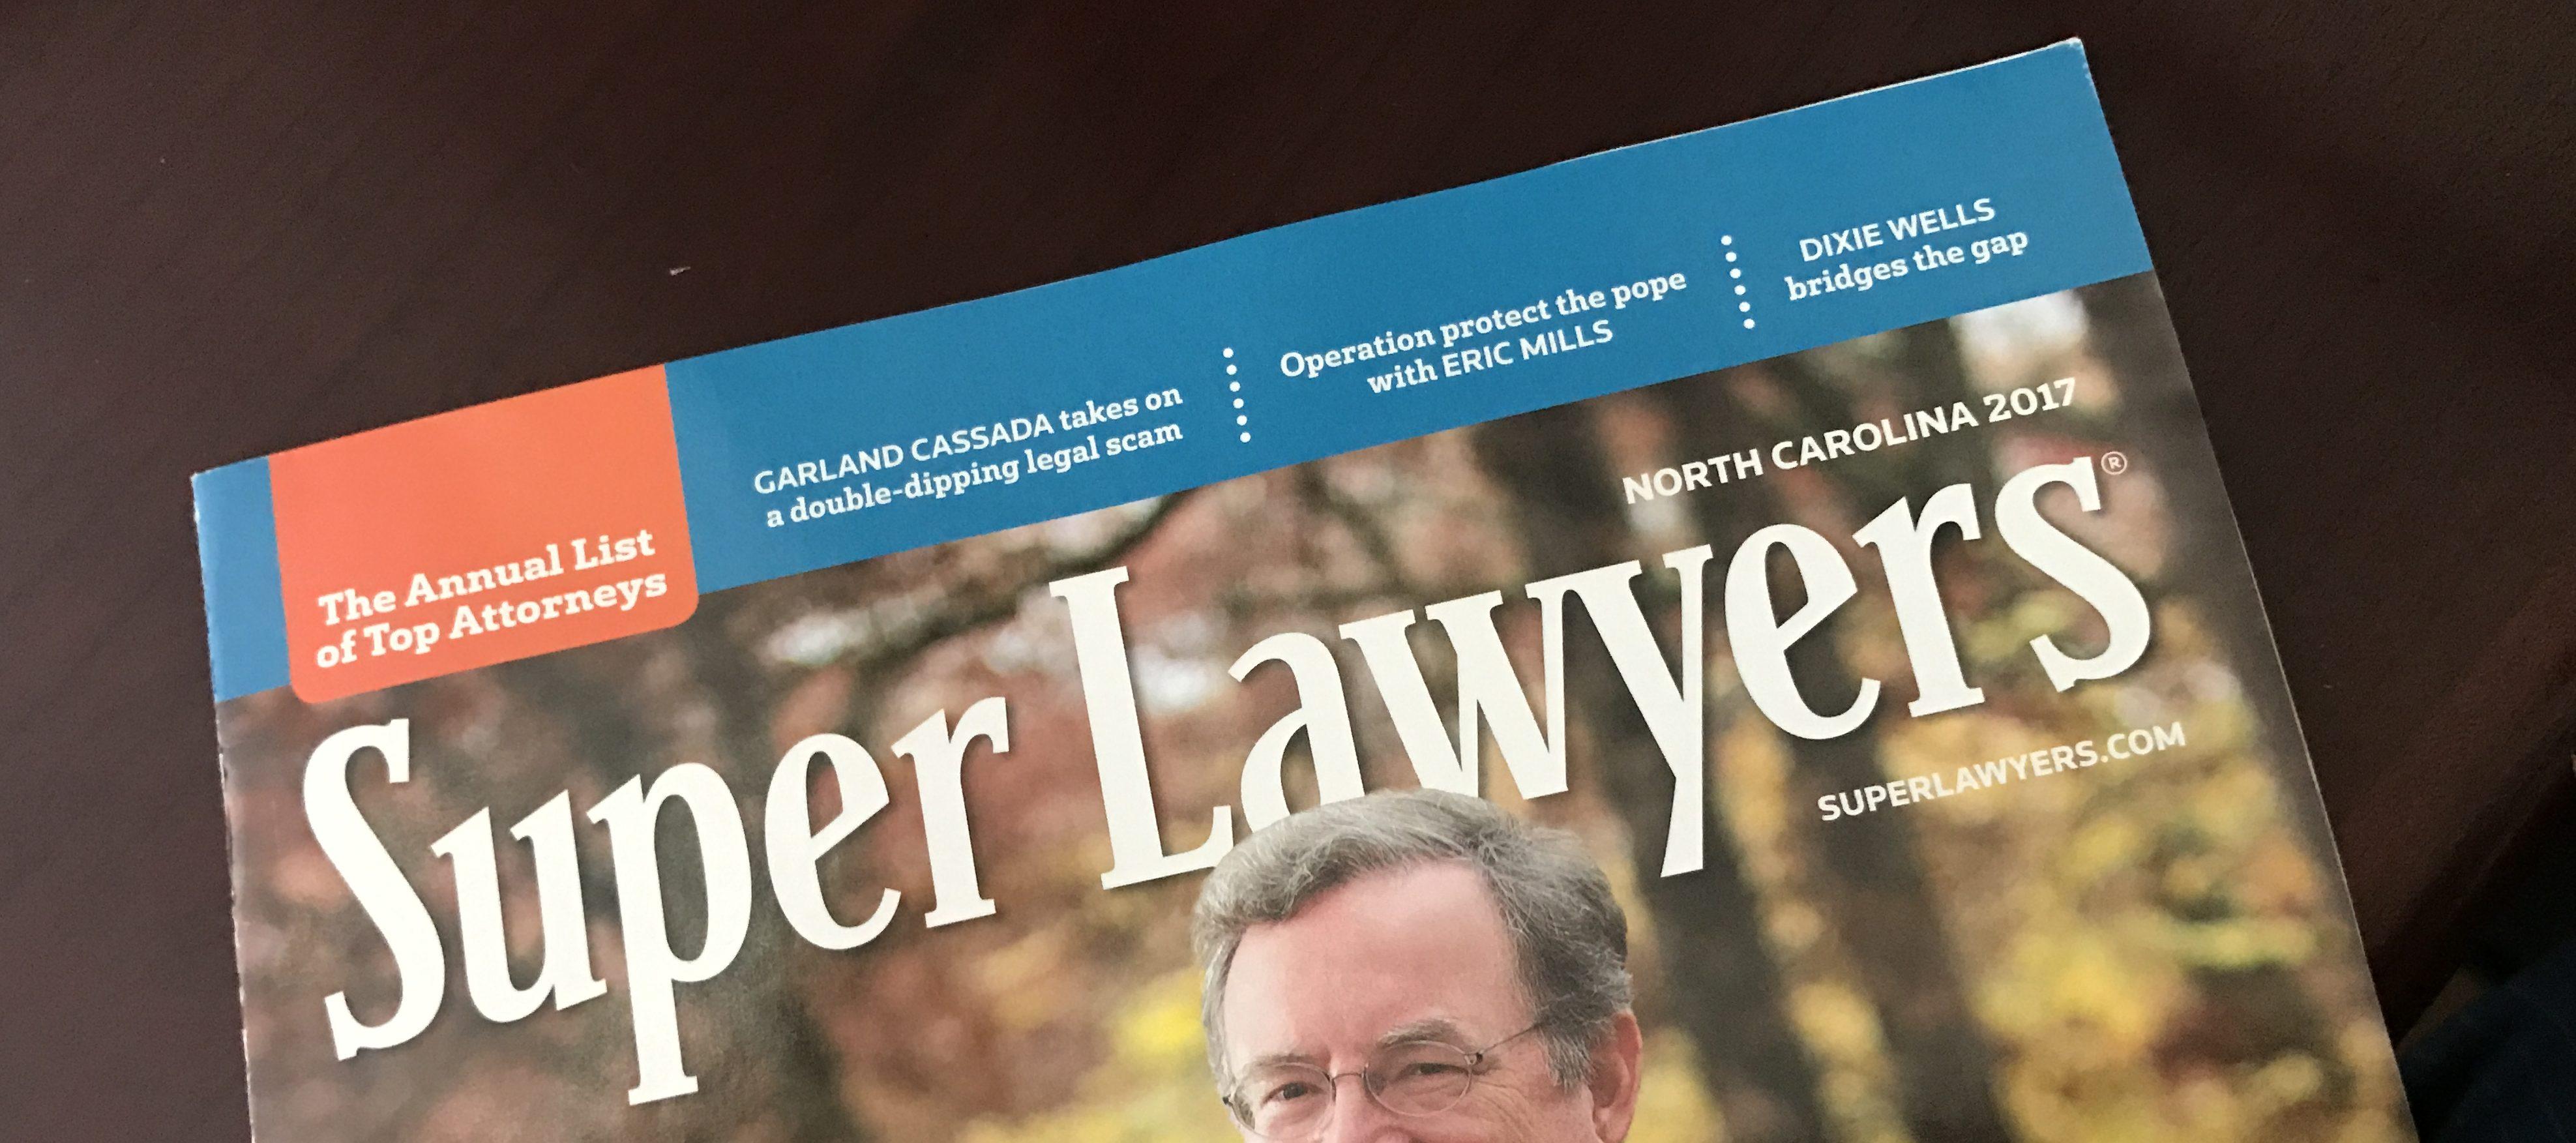 2017 Super Lawyers Magazine Ron Payne Rising Star